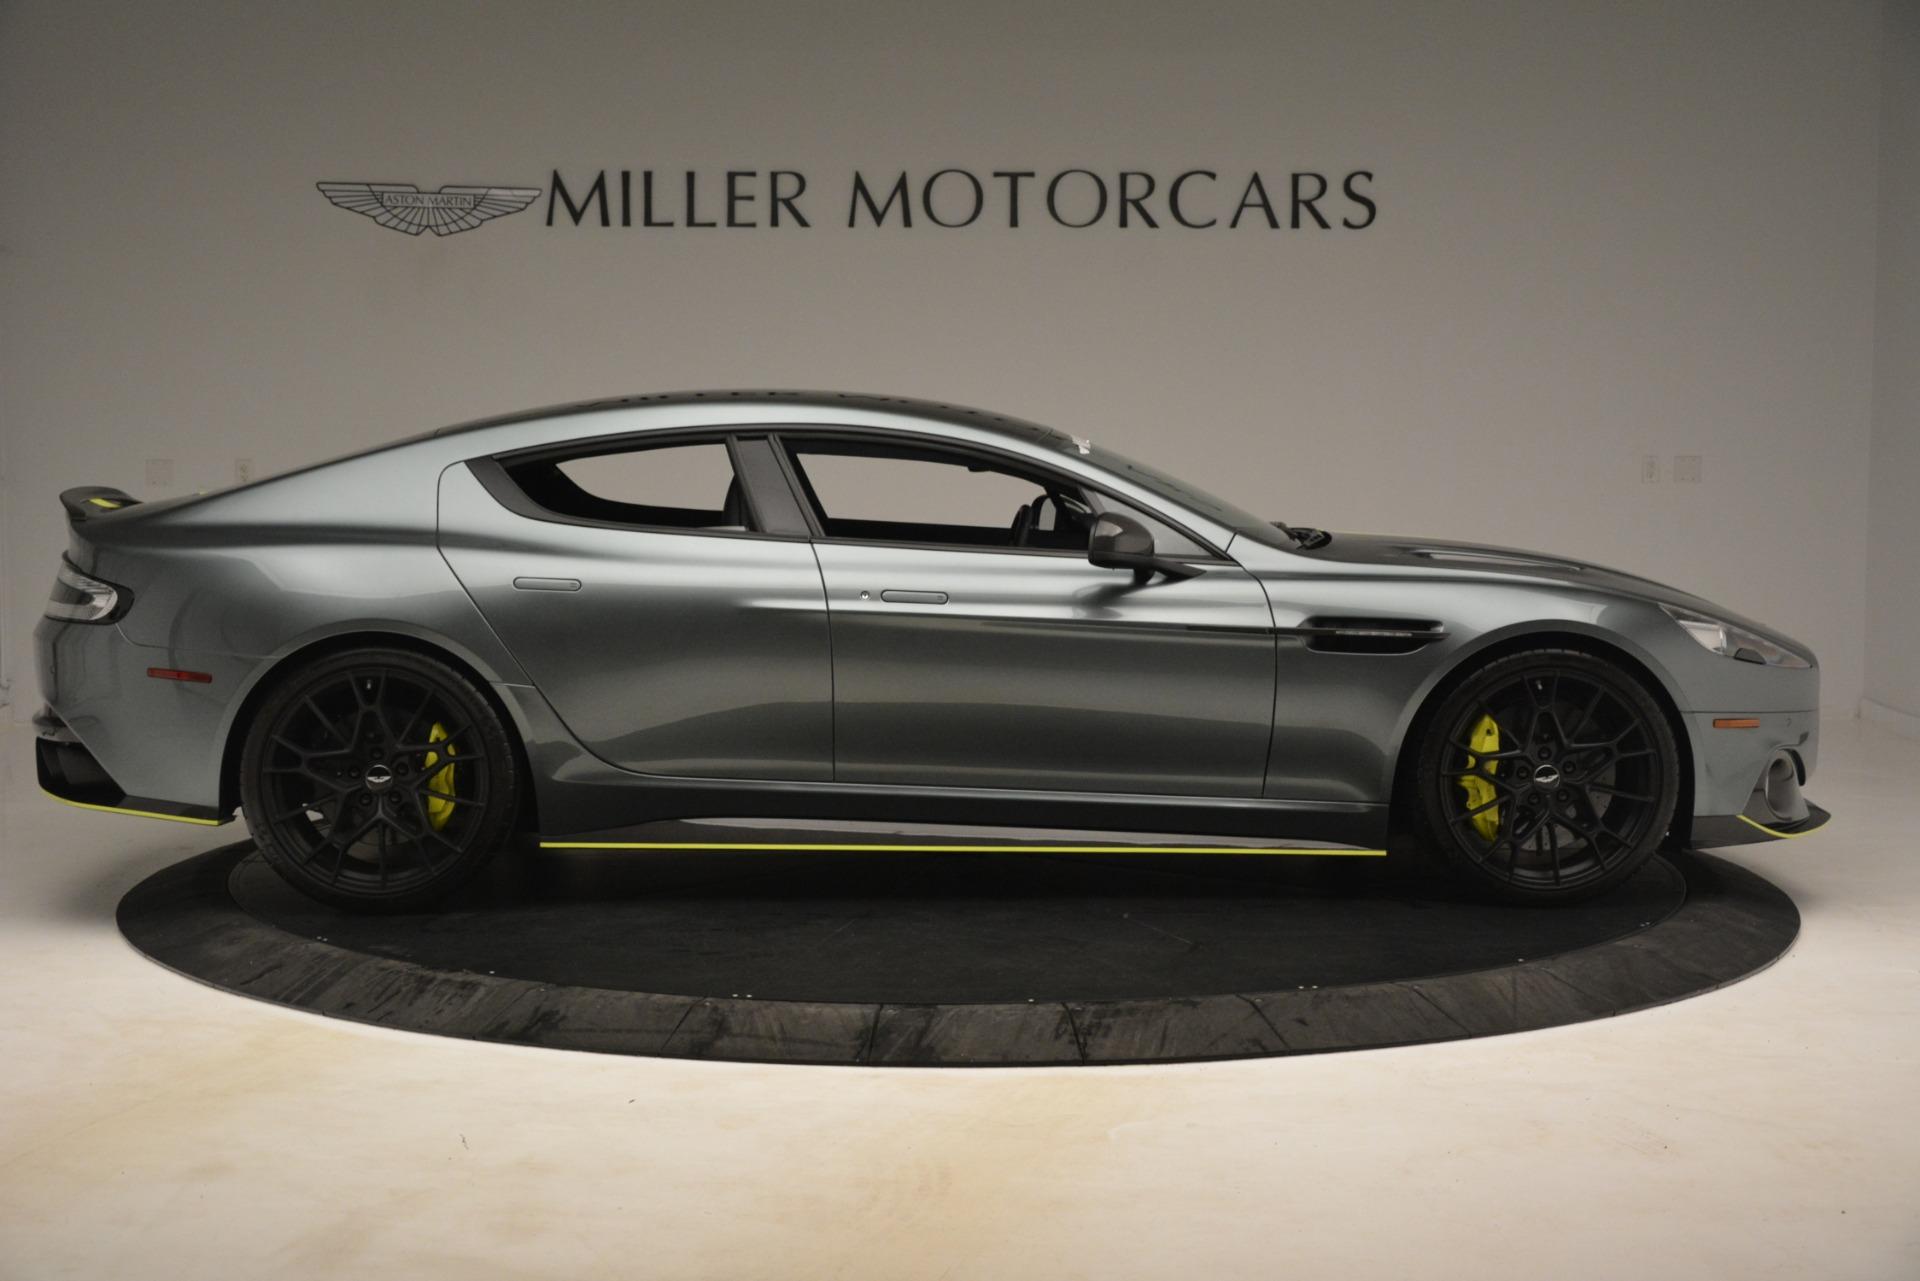 New 2019 Aston Martin Rapide AMR Sedan For Sale In Westport, CT 2975_p9